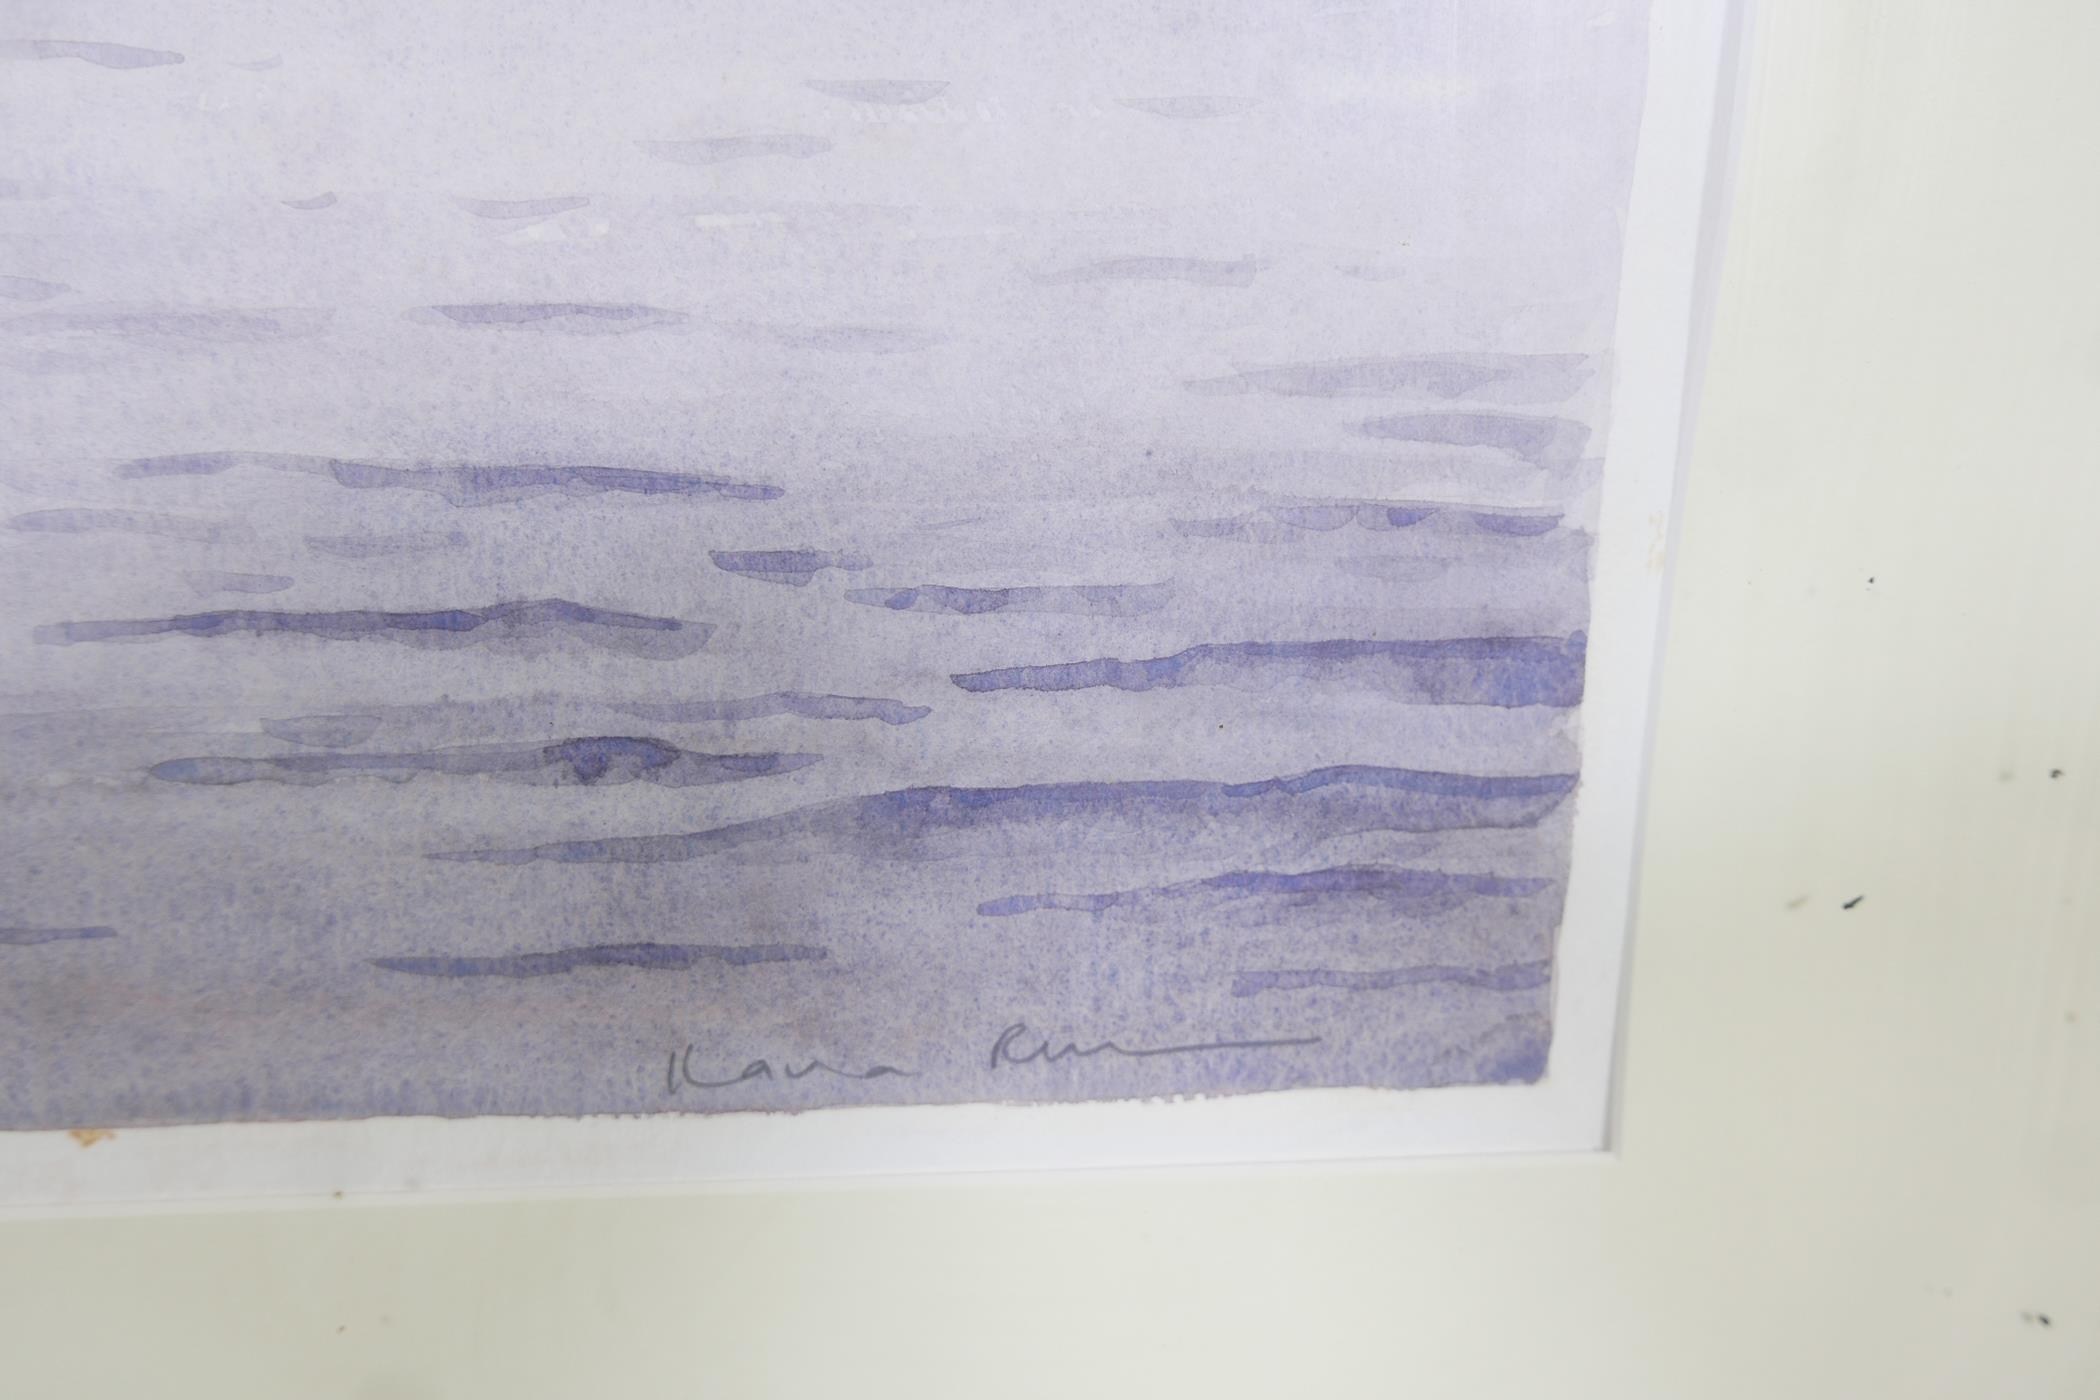 "A colour print of Venice lagoon, Morning mist San Georgio, by Ilana Richardson, 28"" x 20½"" - Image 3 of 4"